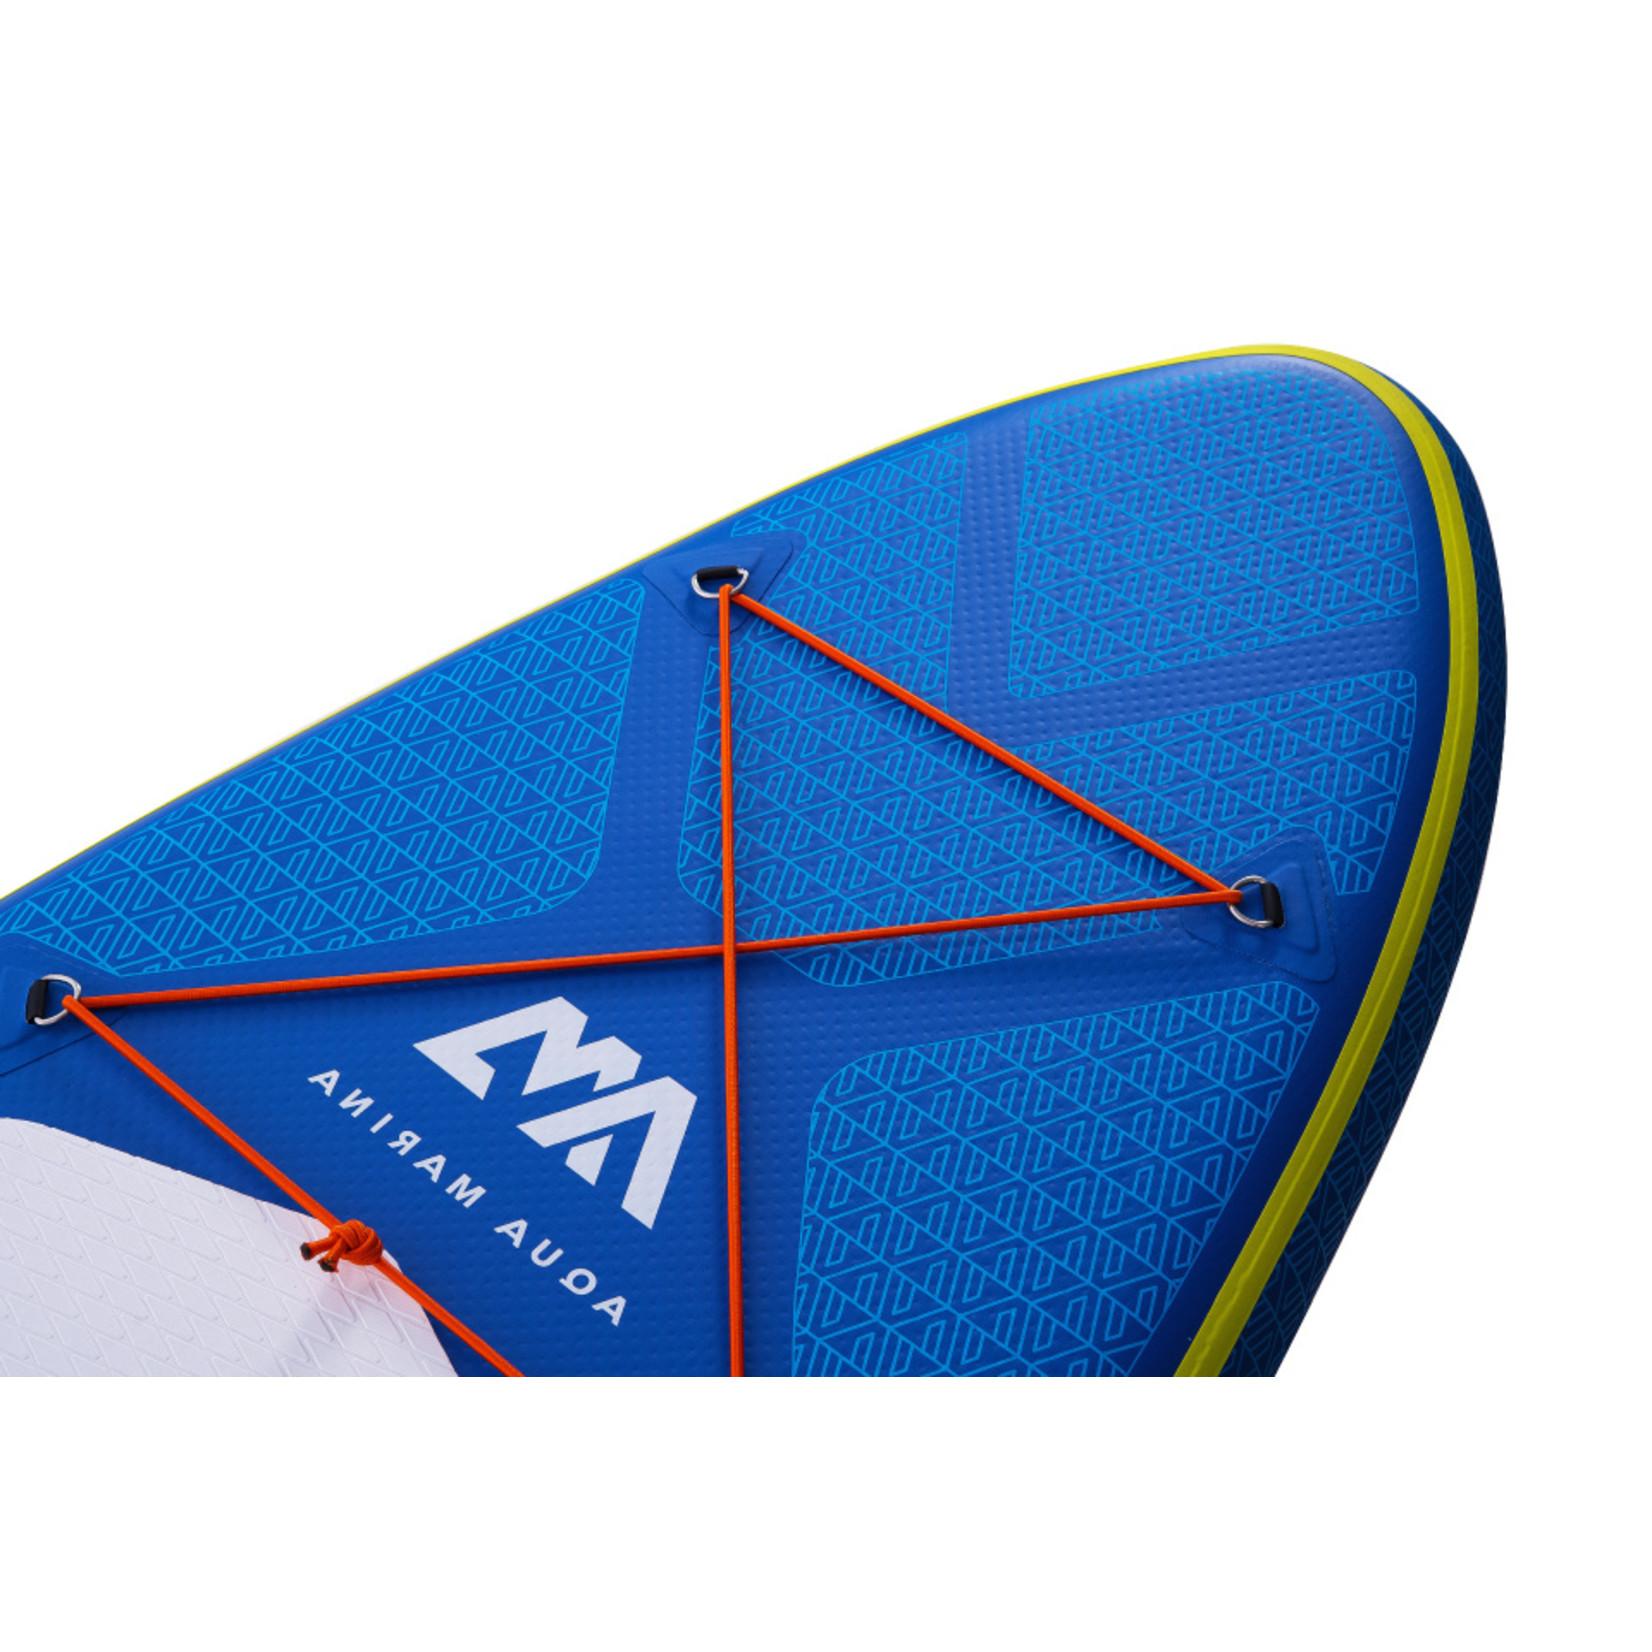 Aqua Marina All Round Advanced Beast - Inflatable Paddle Board Advanced